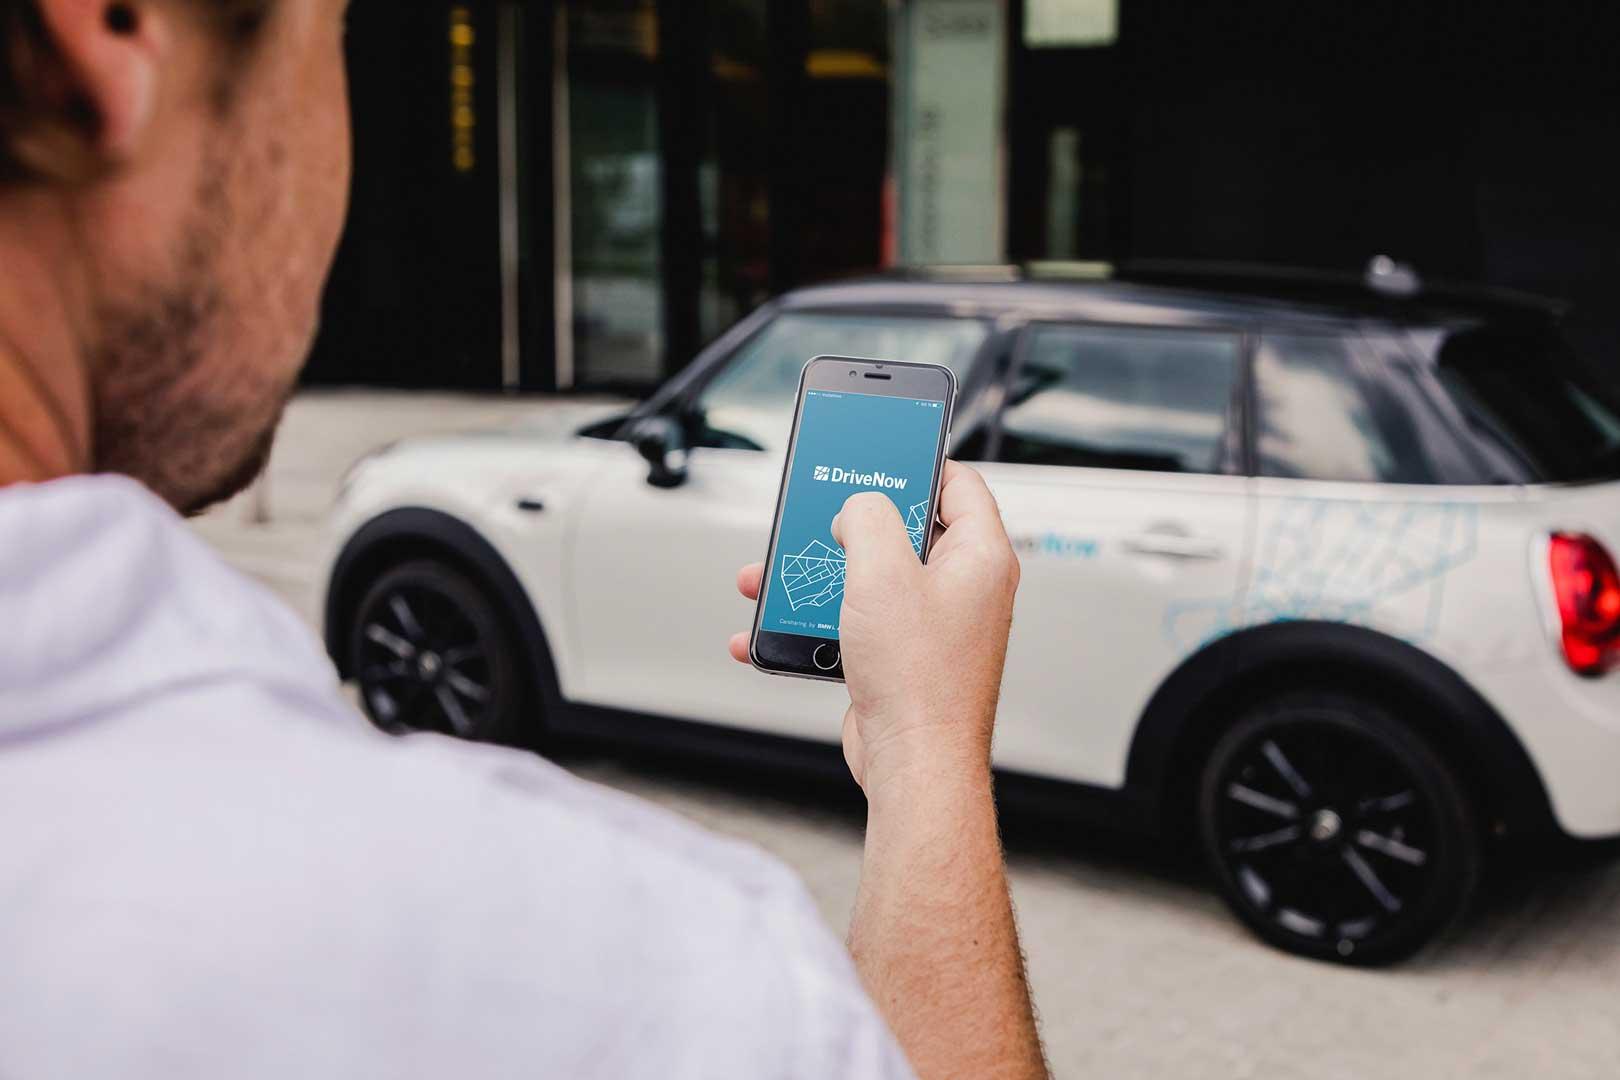 drivenow-car-sharing-milano-bmw-mini-app